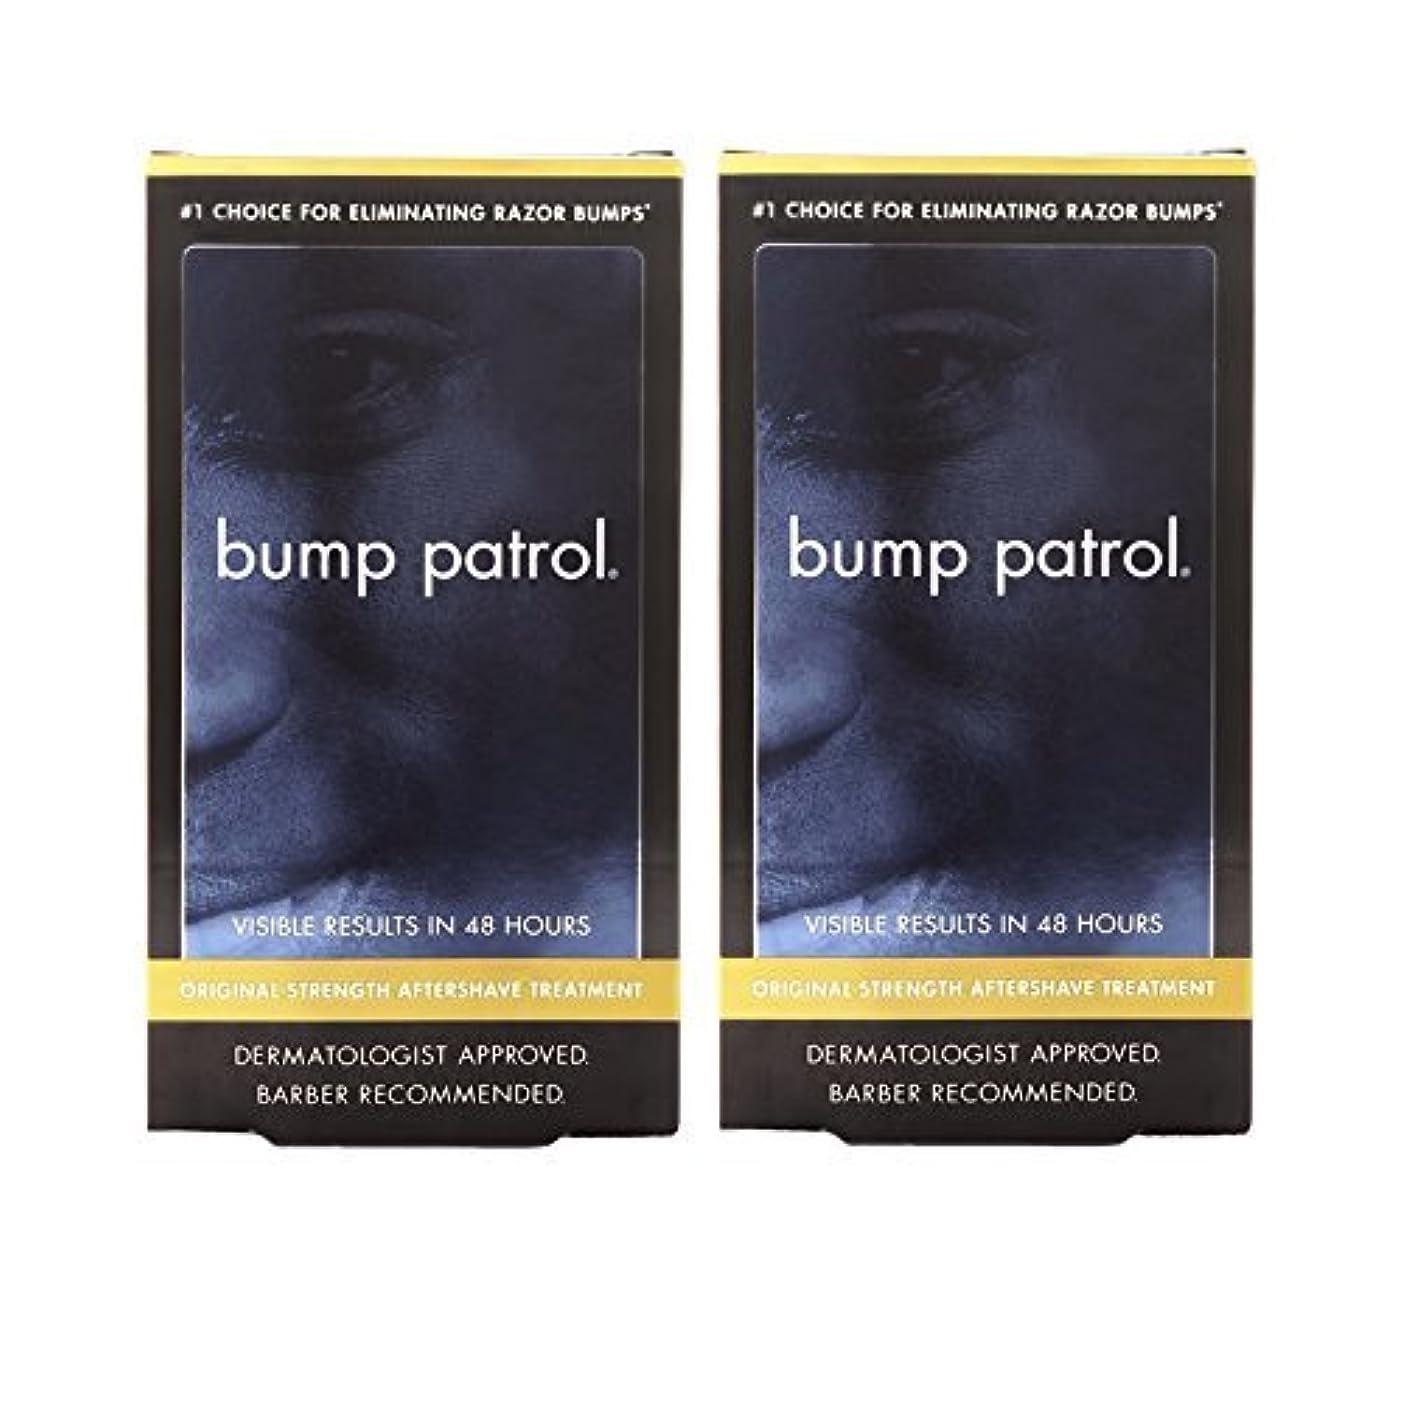 流体放課後霧Bump Patrol Dermatologist Approved Original Strength Aftershave Treatment (2 oz) 2 Pack [並行輸入品]